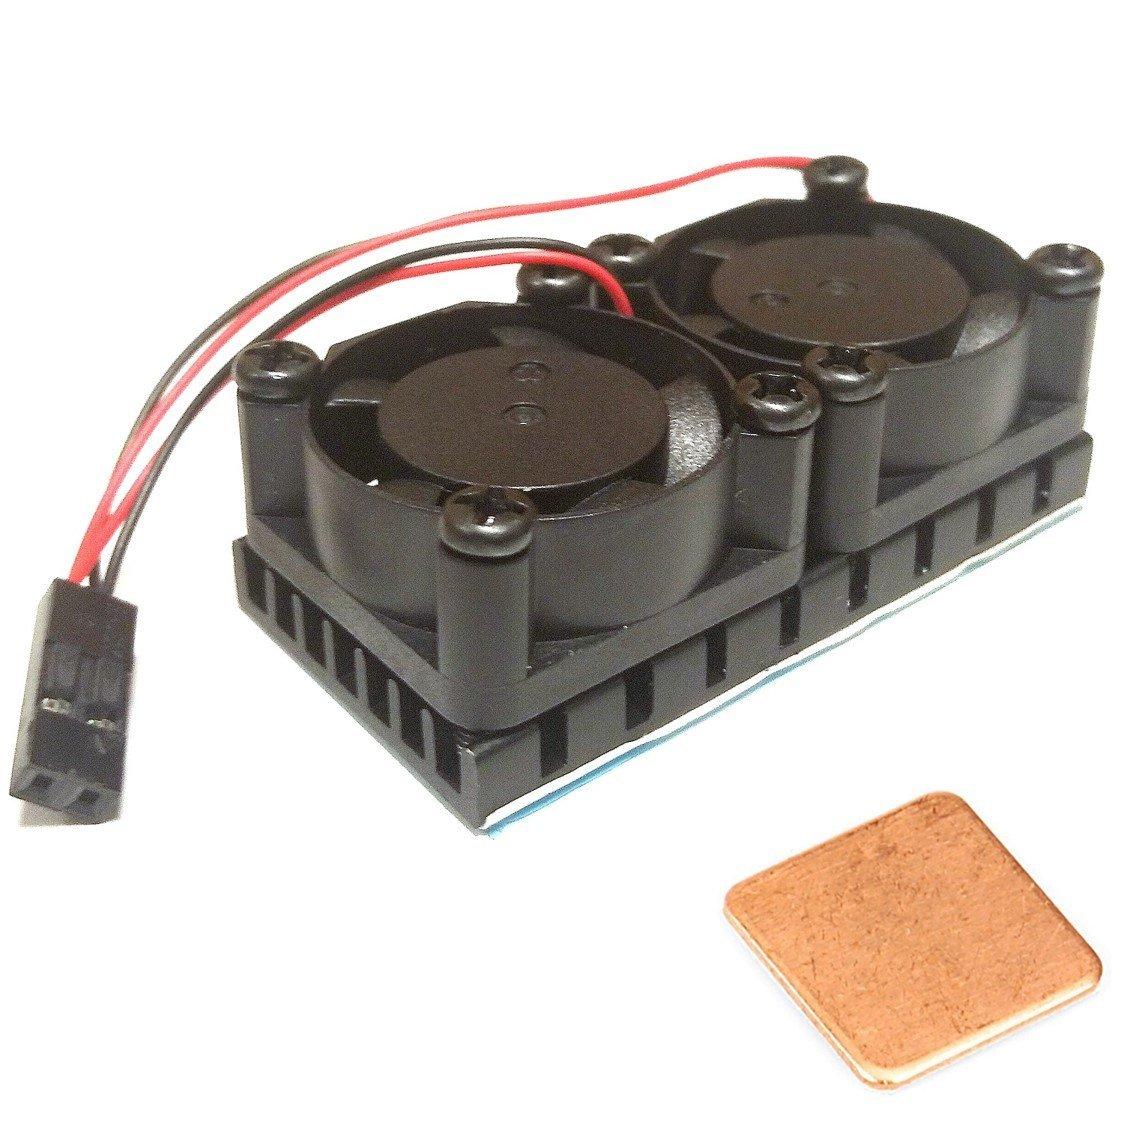 Easycargo Raspberry Pi Dual Fan Heatsink kit + Copper pad shim + pre-applied thermal conductive adhesive tape for cooling Raspberry Pi 3B+, Raspberry Pi 3 B, Raspberry Pi 2, Raspberry Pi B+